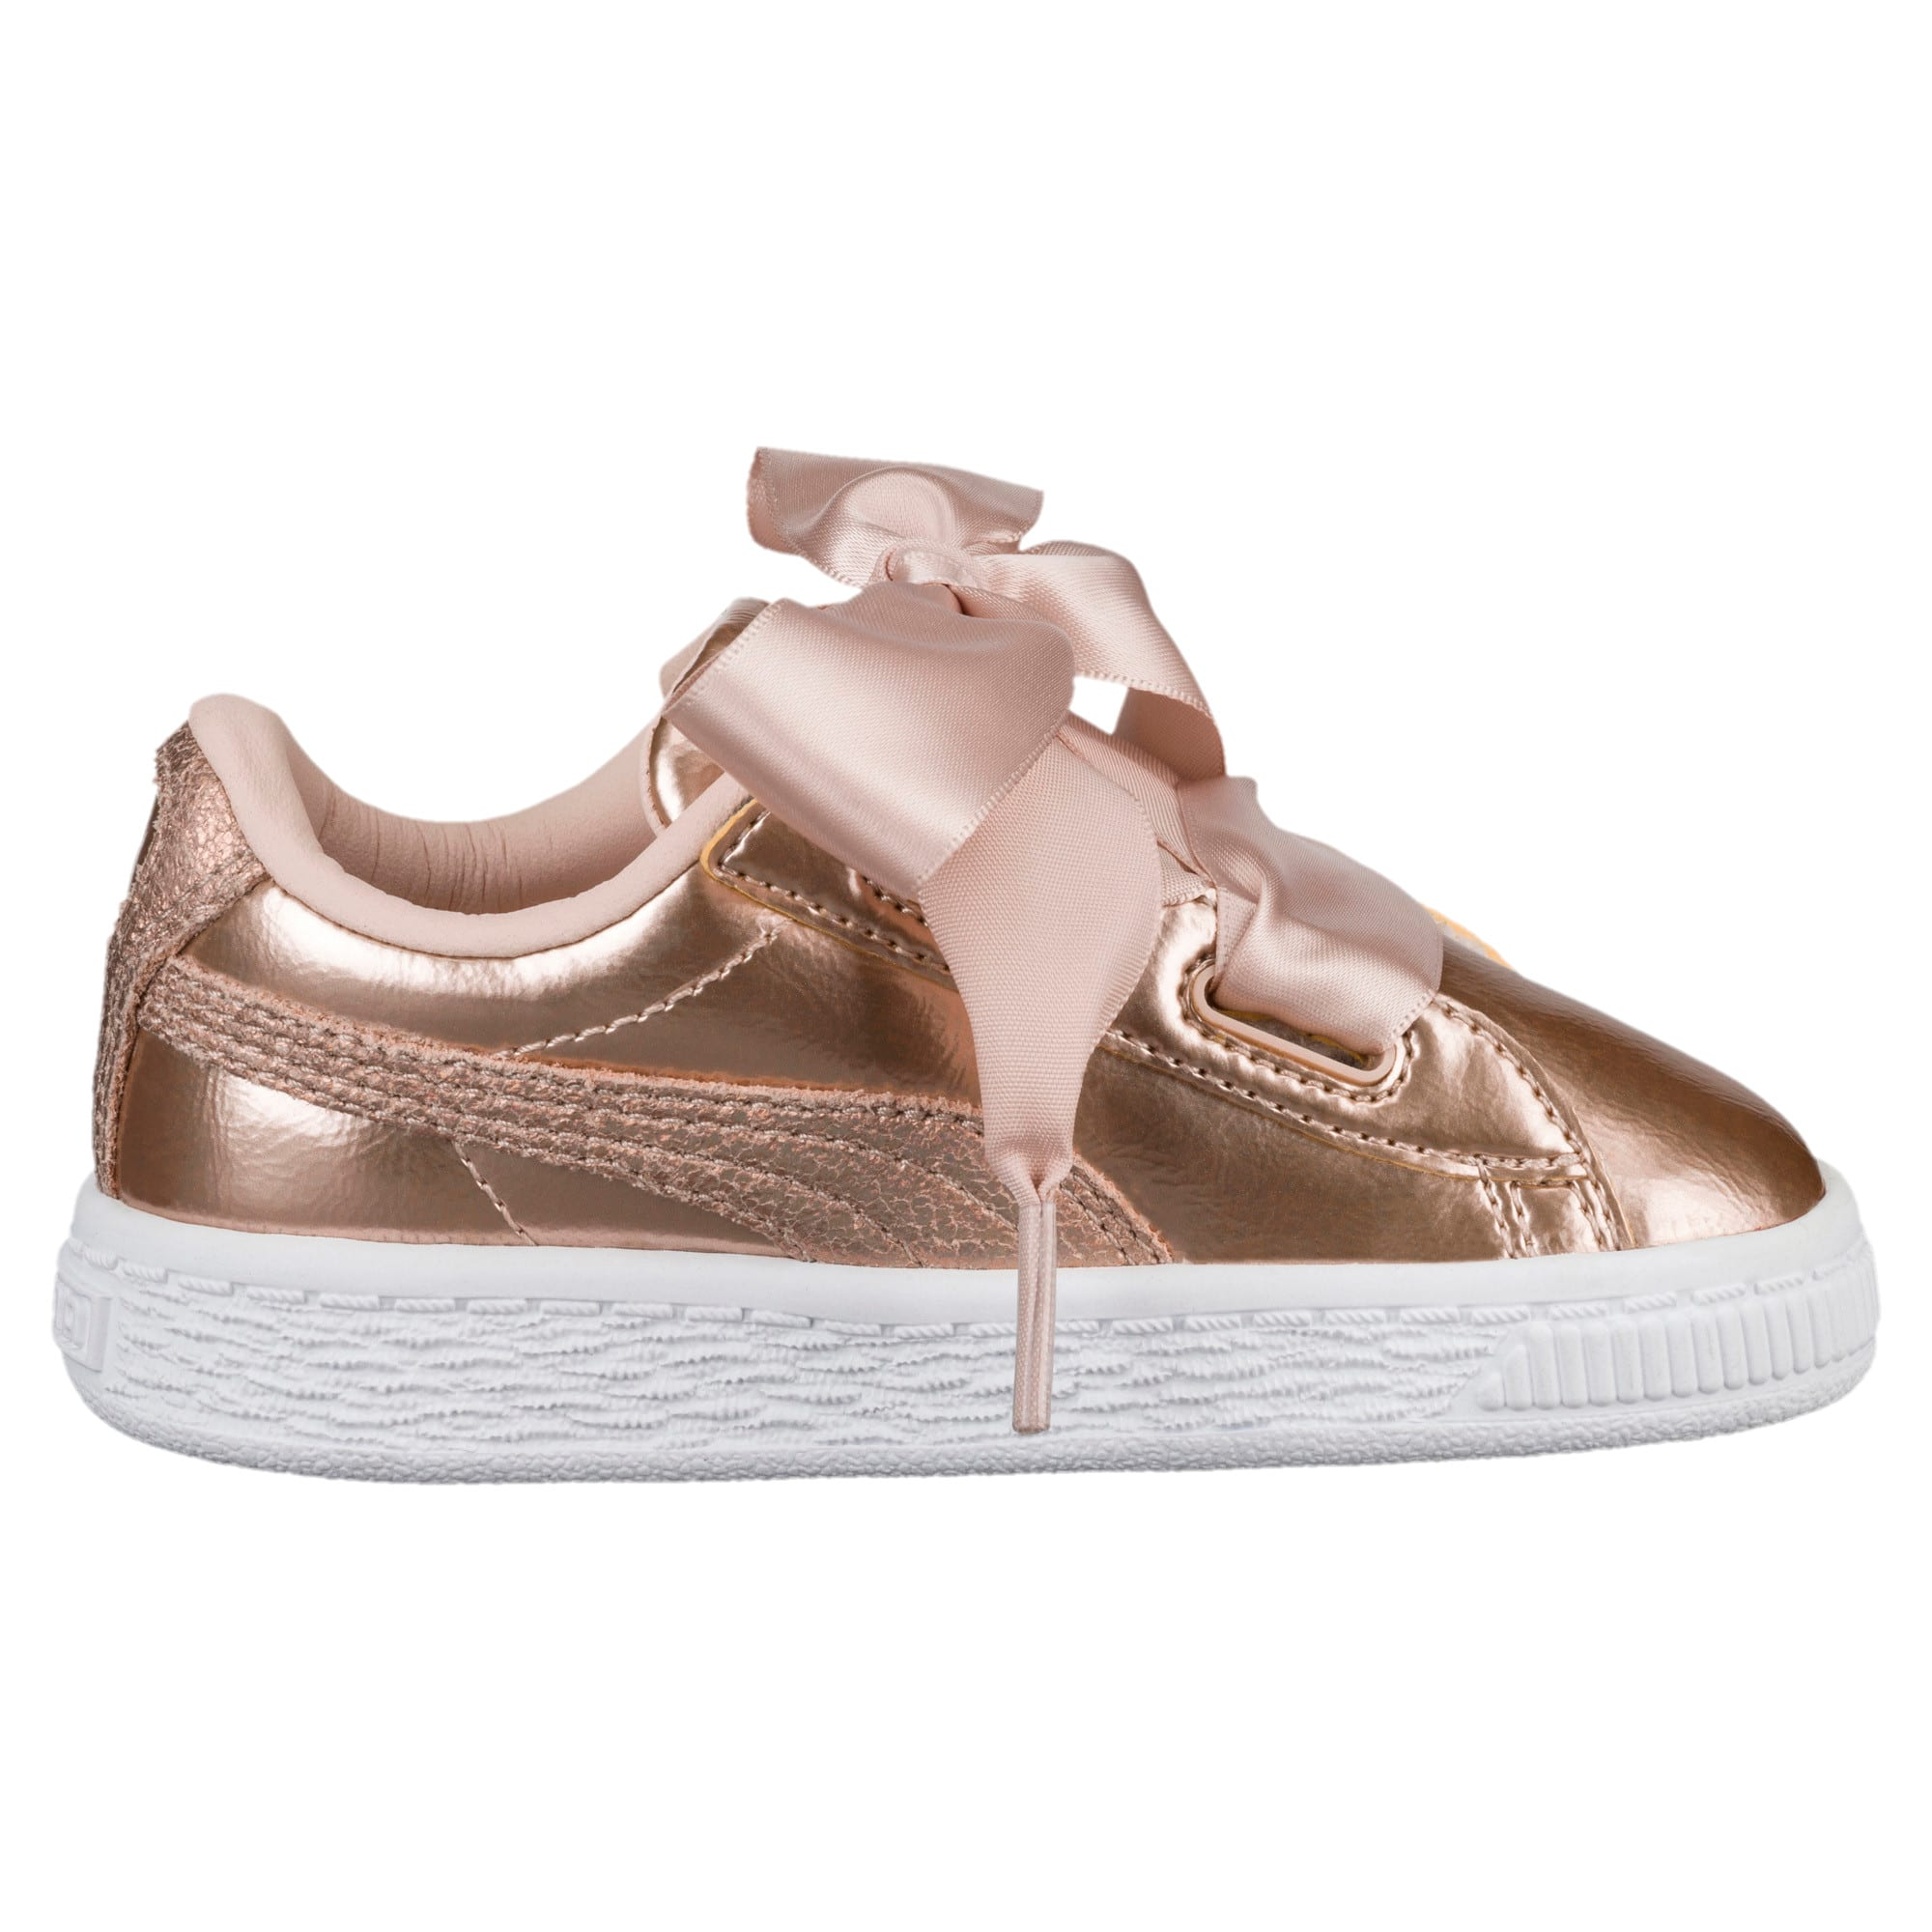 wholesale dealer 78450 38da1 Basket Heart Lunar Lux Little Kids' Shoes